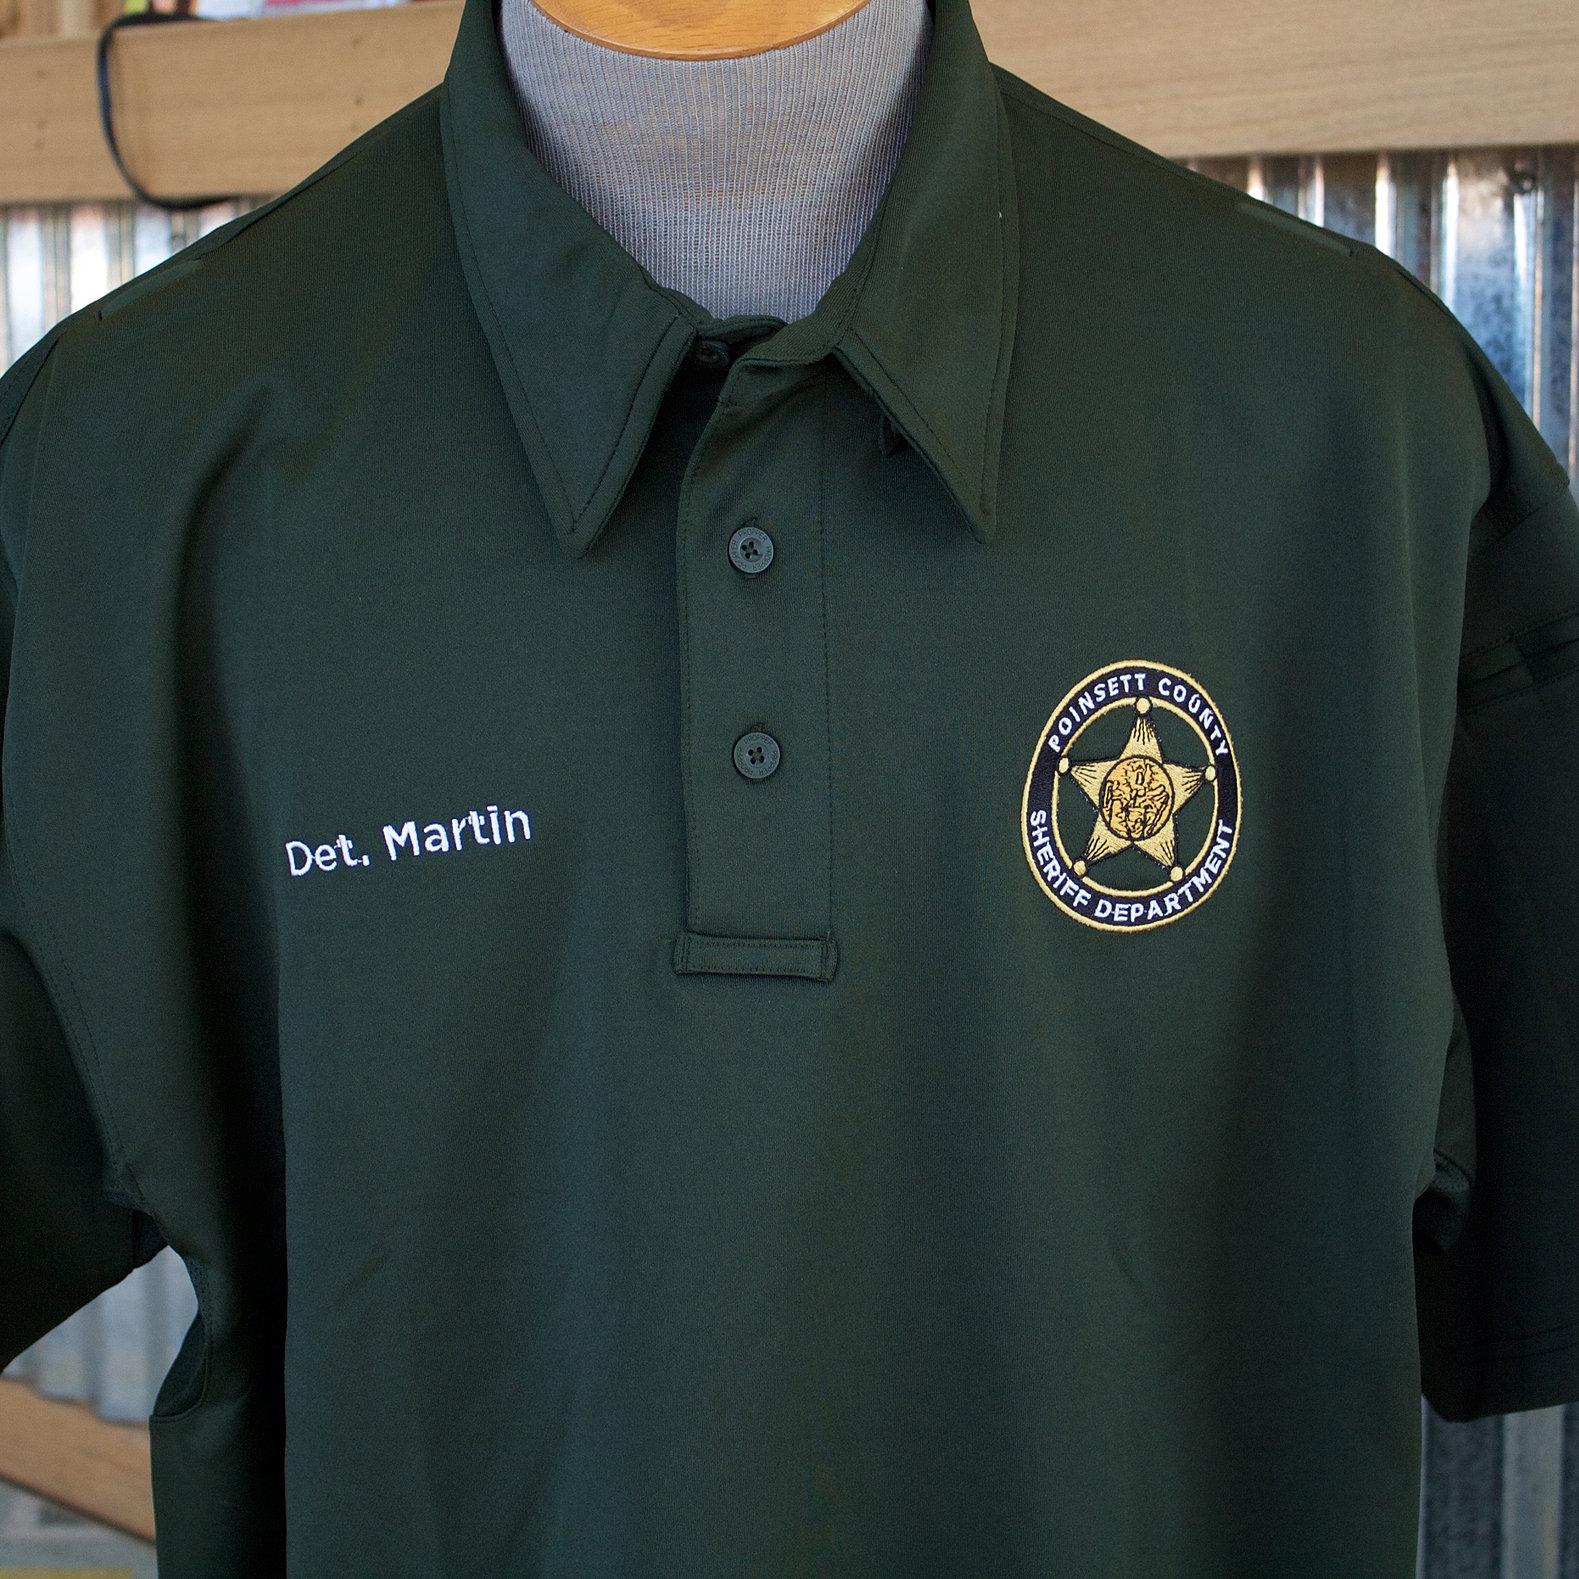 T shirt design jonesboro ar - Contact